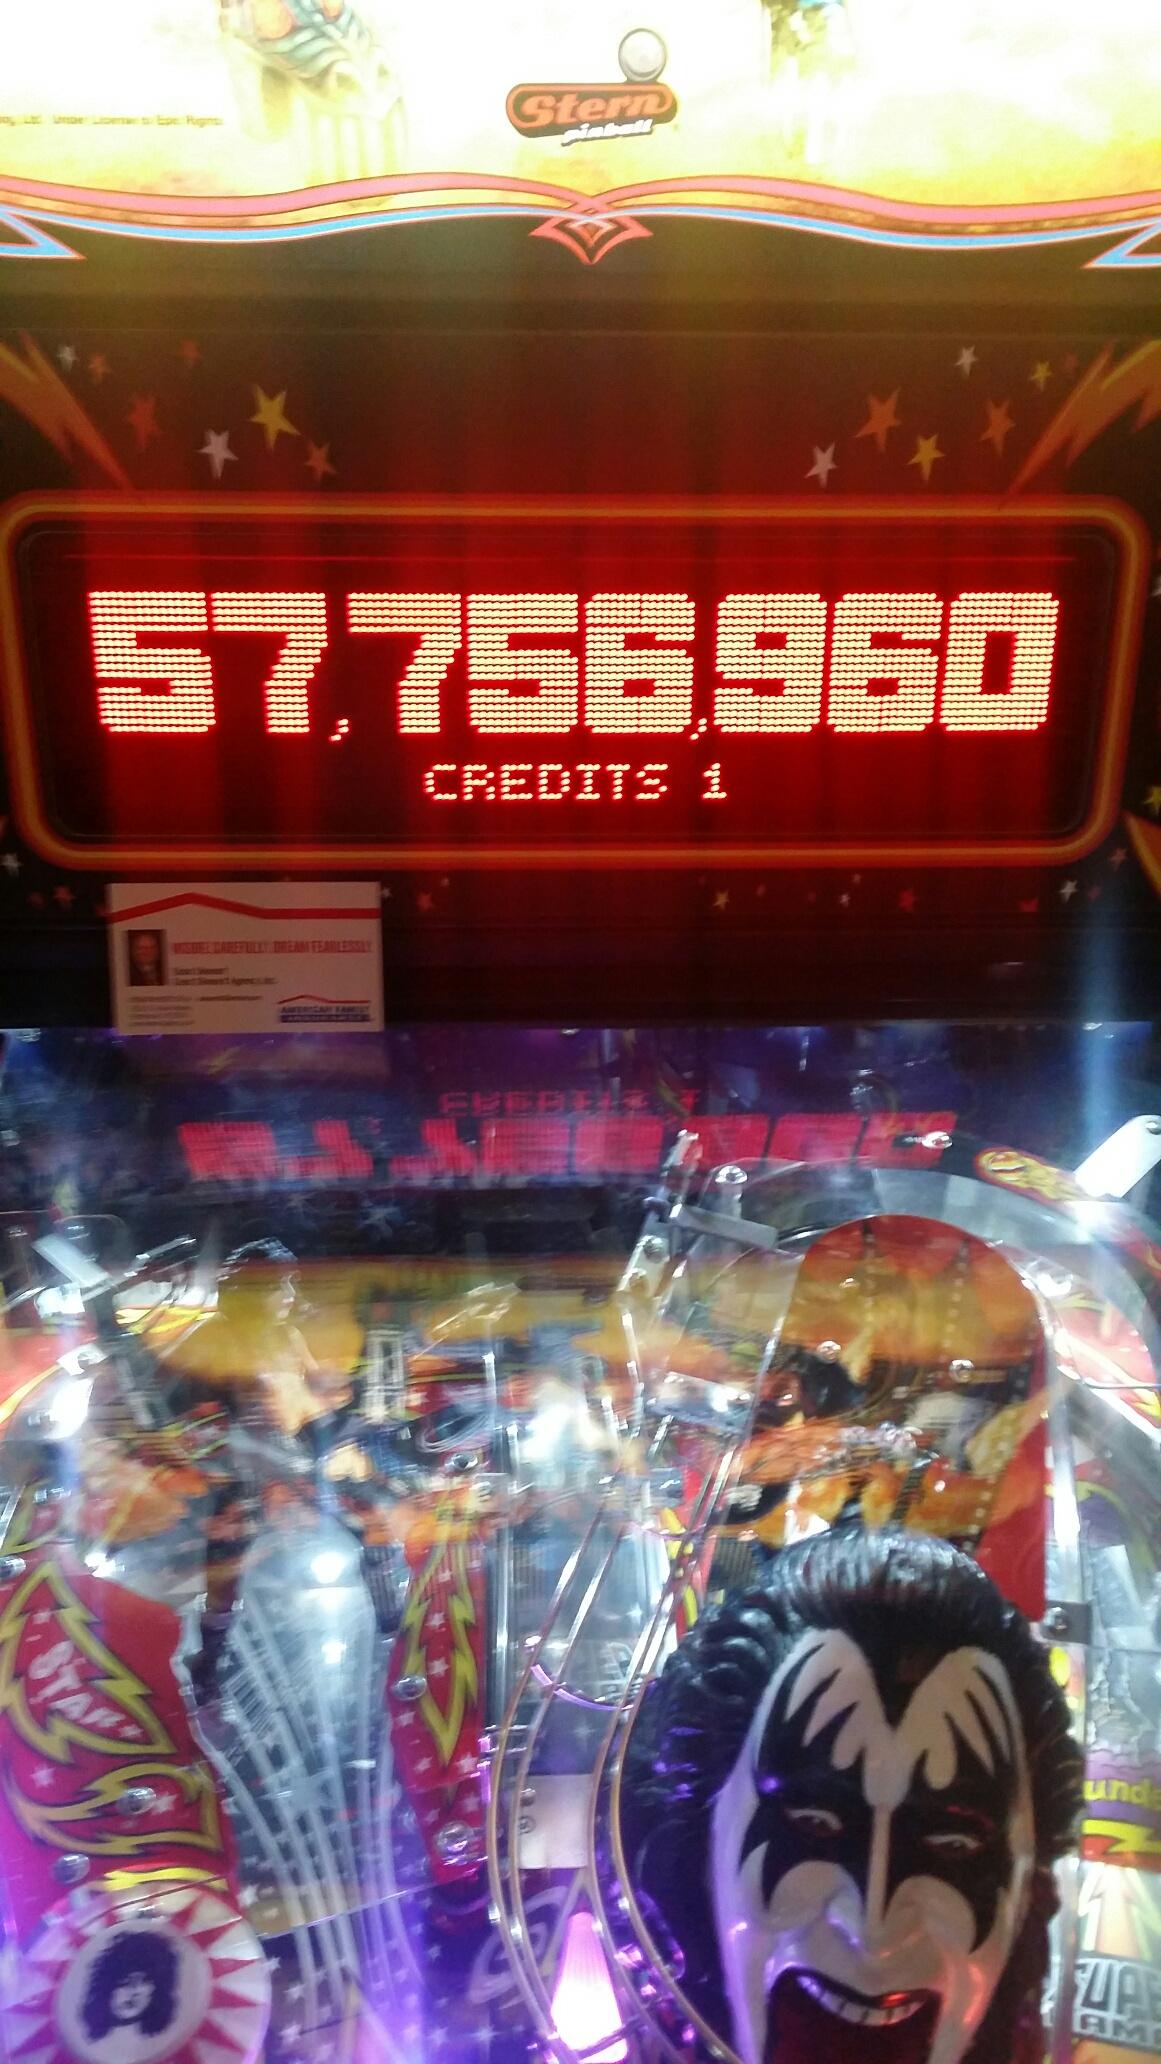 SeanStewart: Kiss [Stern Pinball] (Pinball: 3 Balls) 57,756,960 points on 2017-05-18 10:48:38